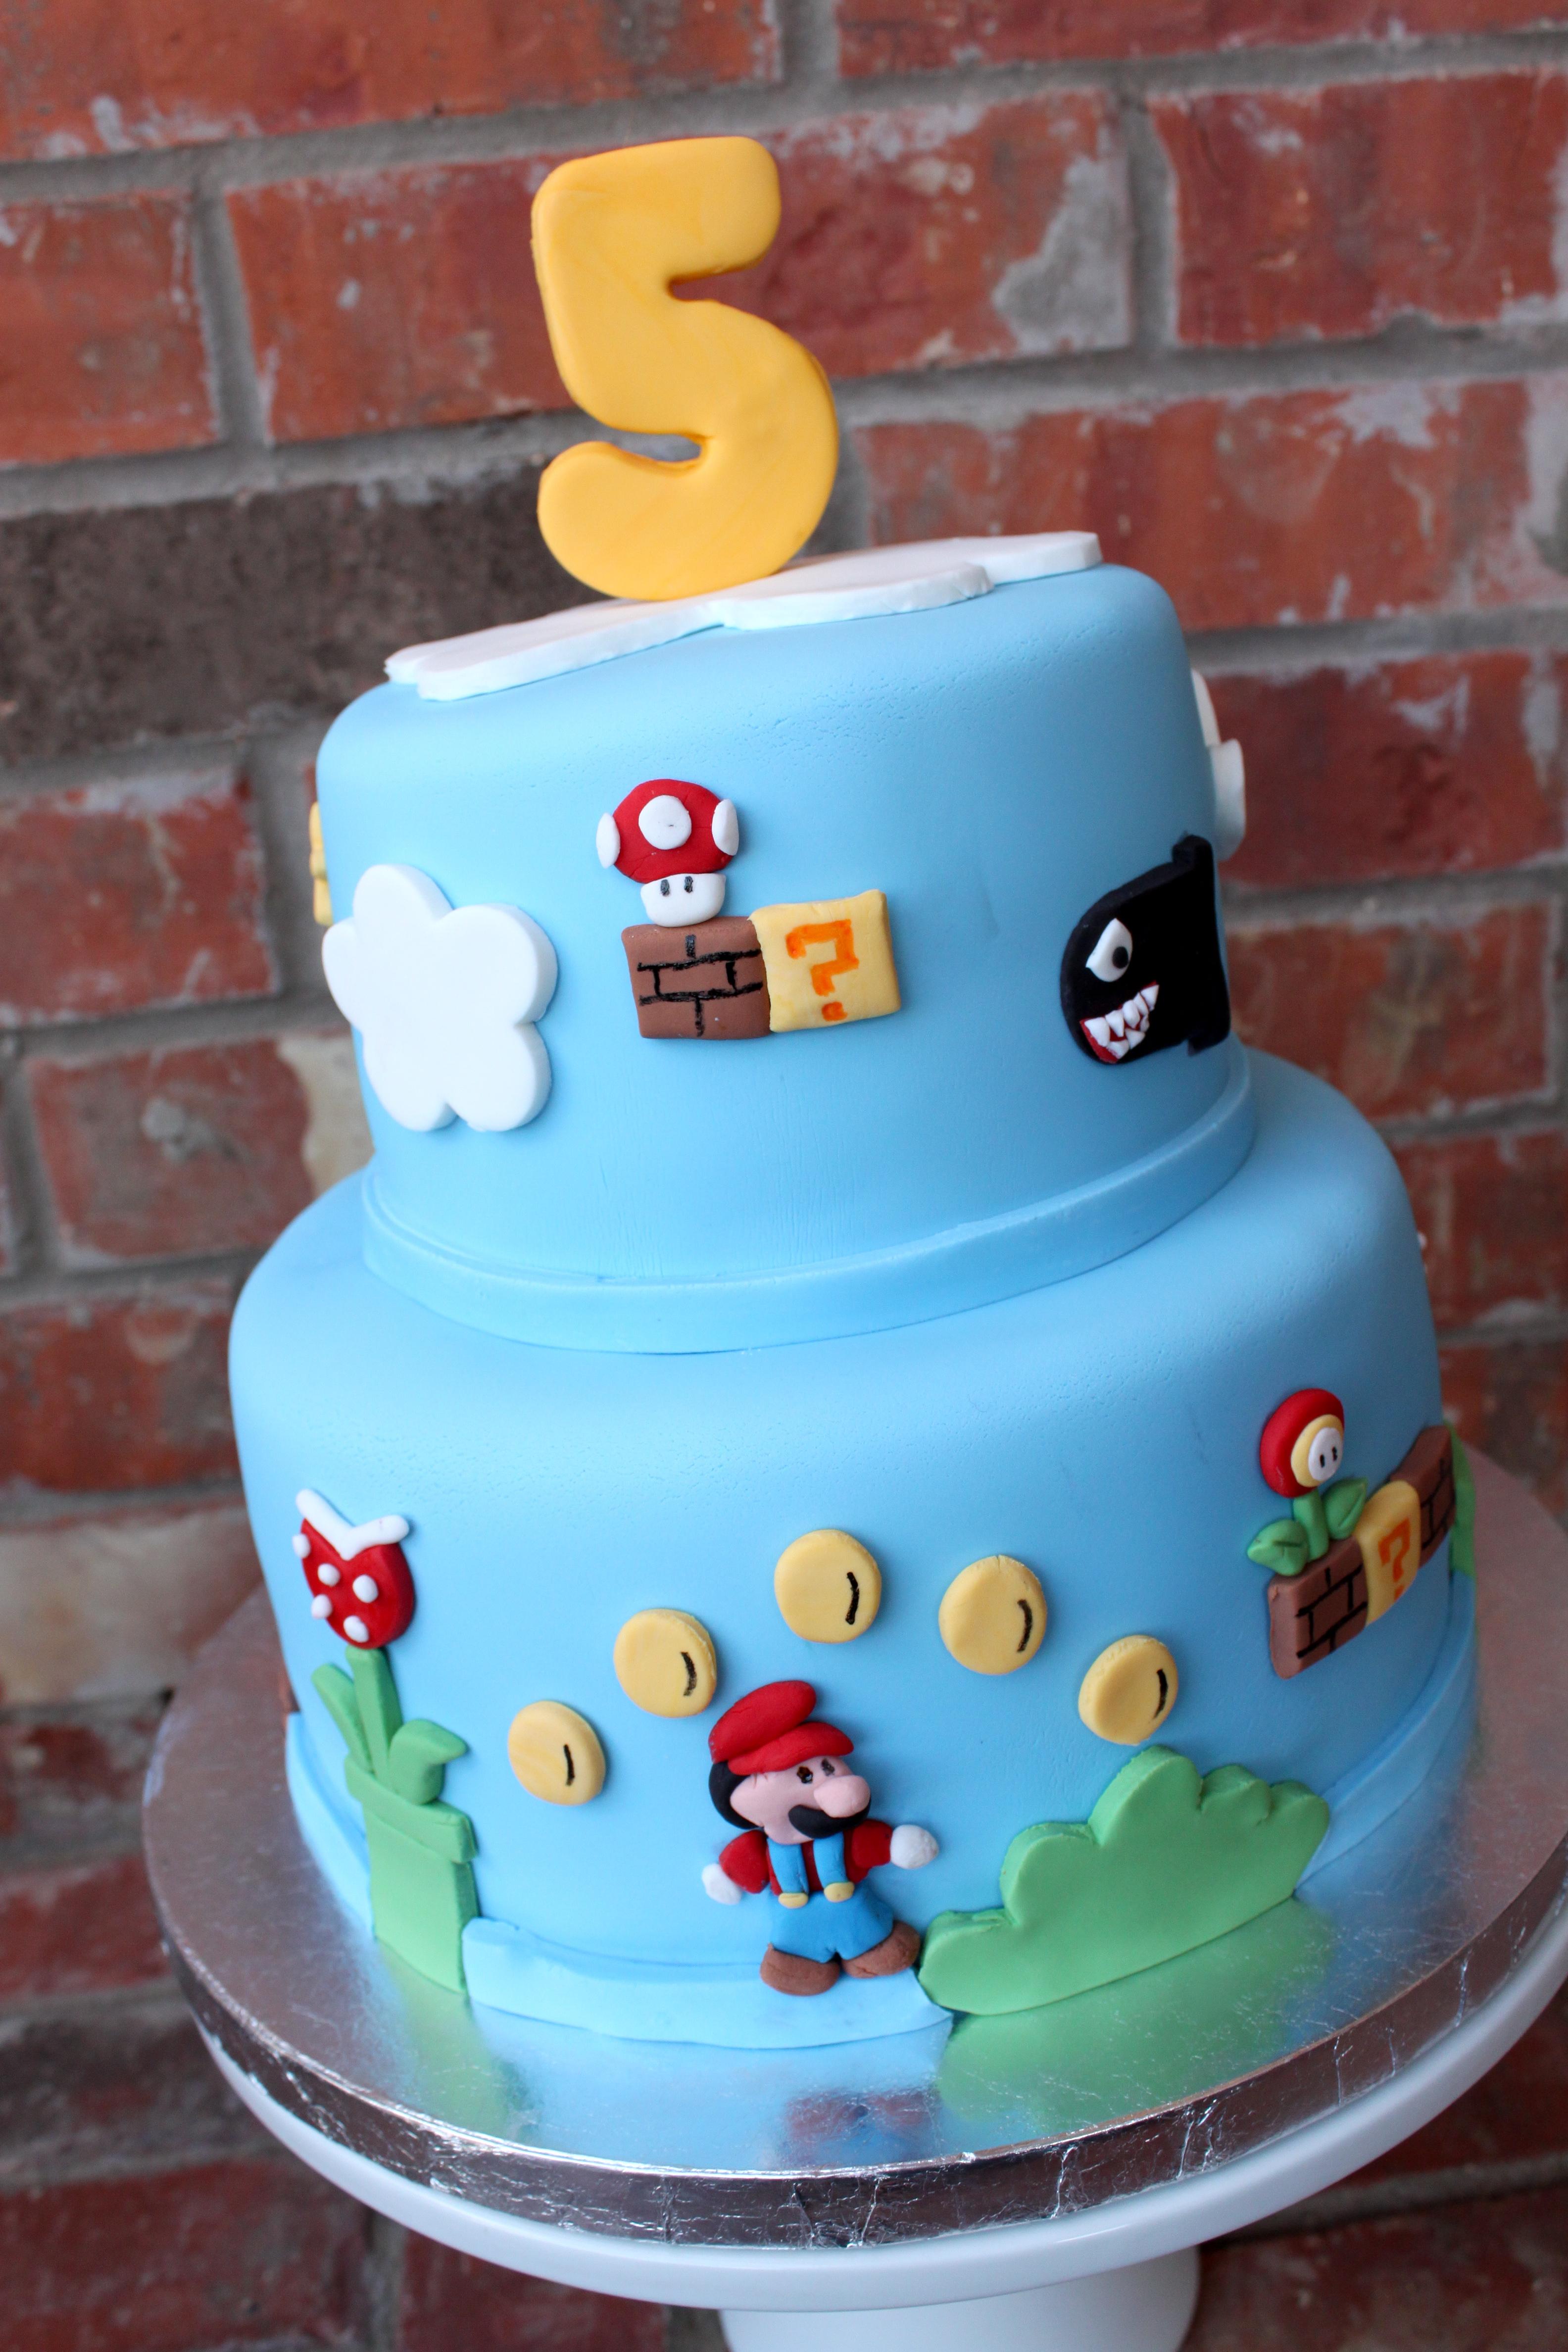 Remarkable Mario Cakes Decoration Ideas Little Birthday Cakes Personalised Birthday Cards Veneteletsinfo